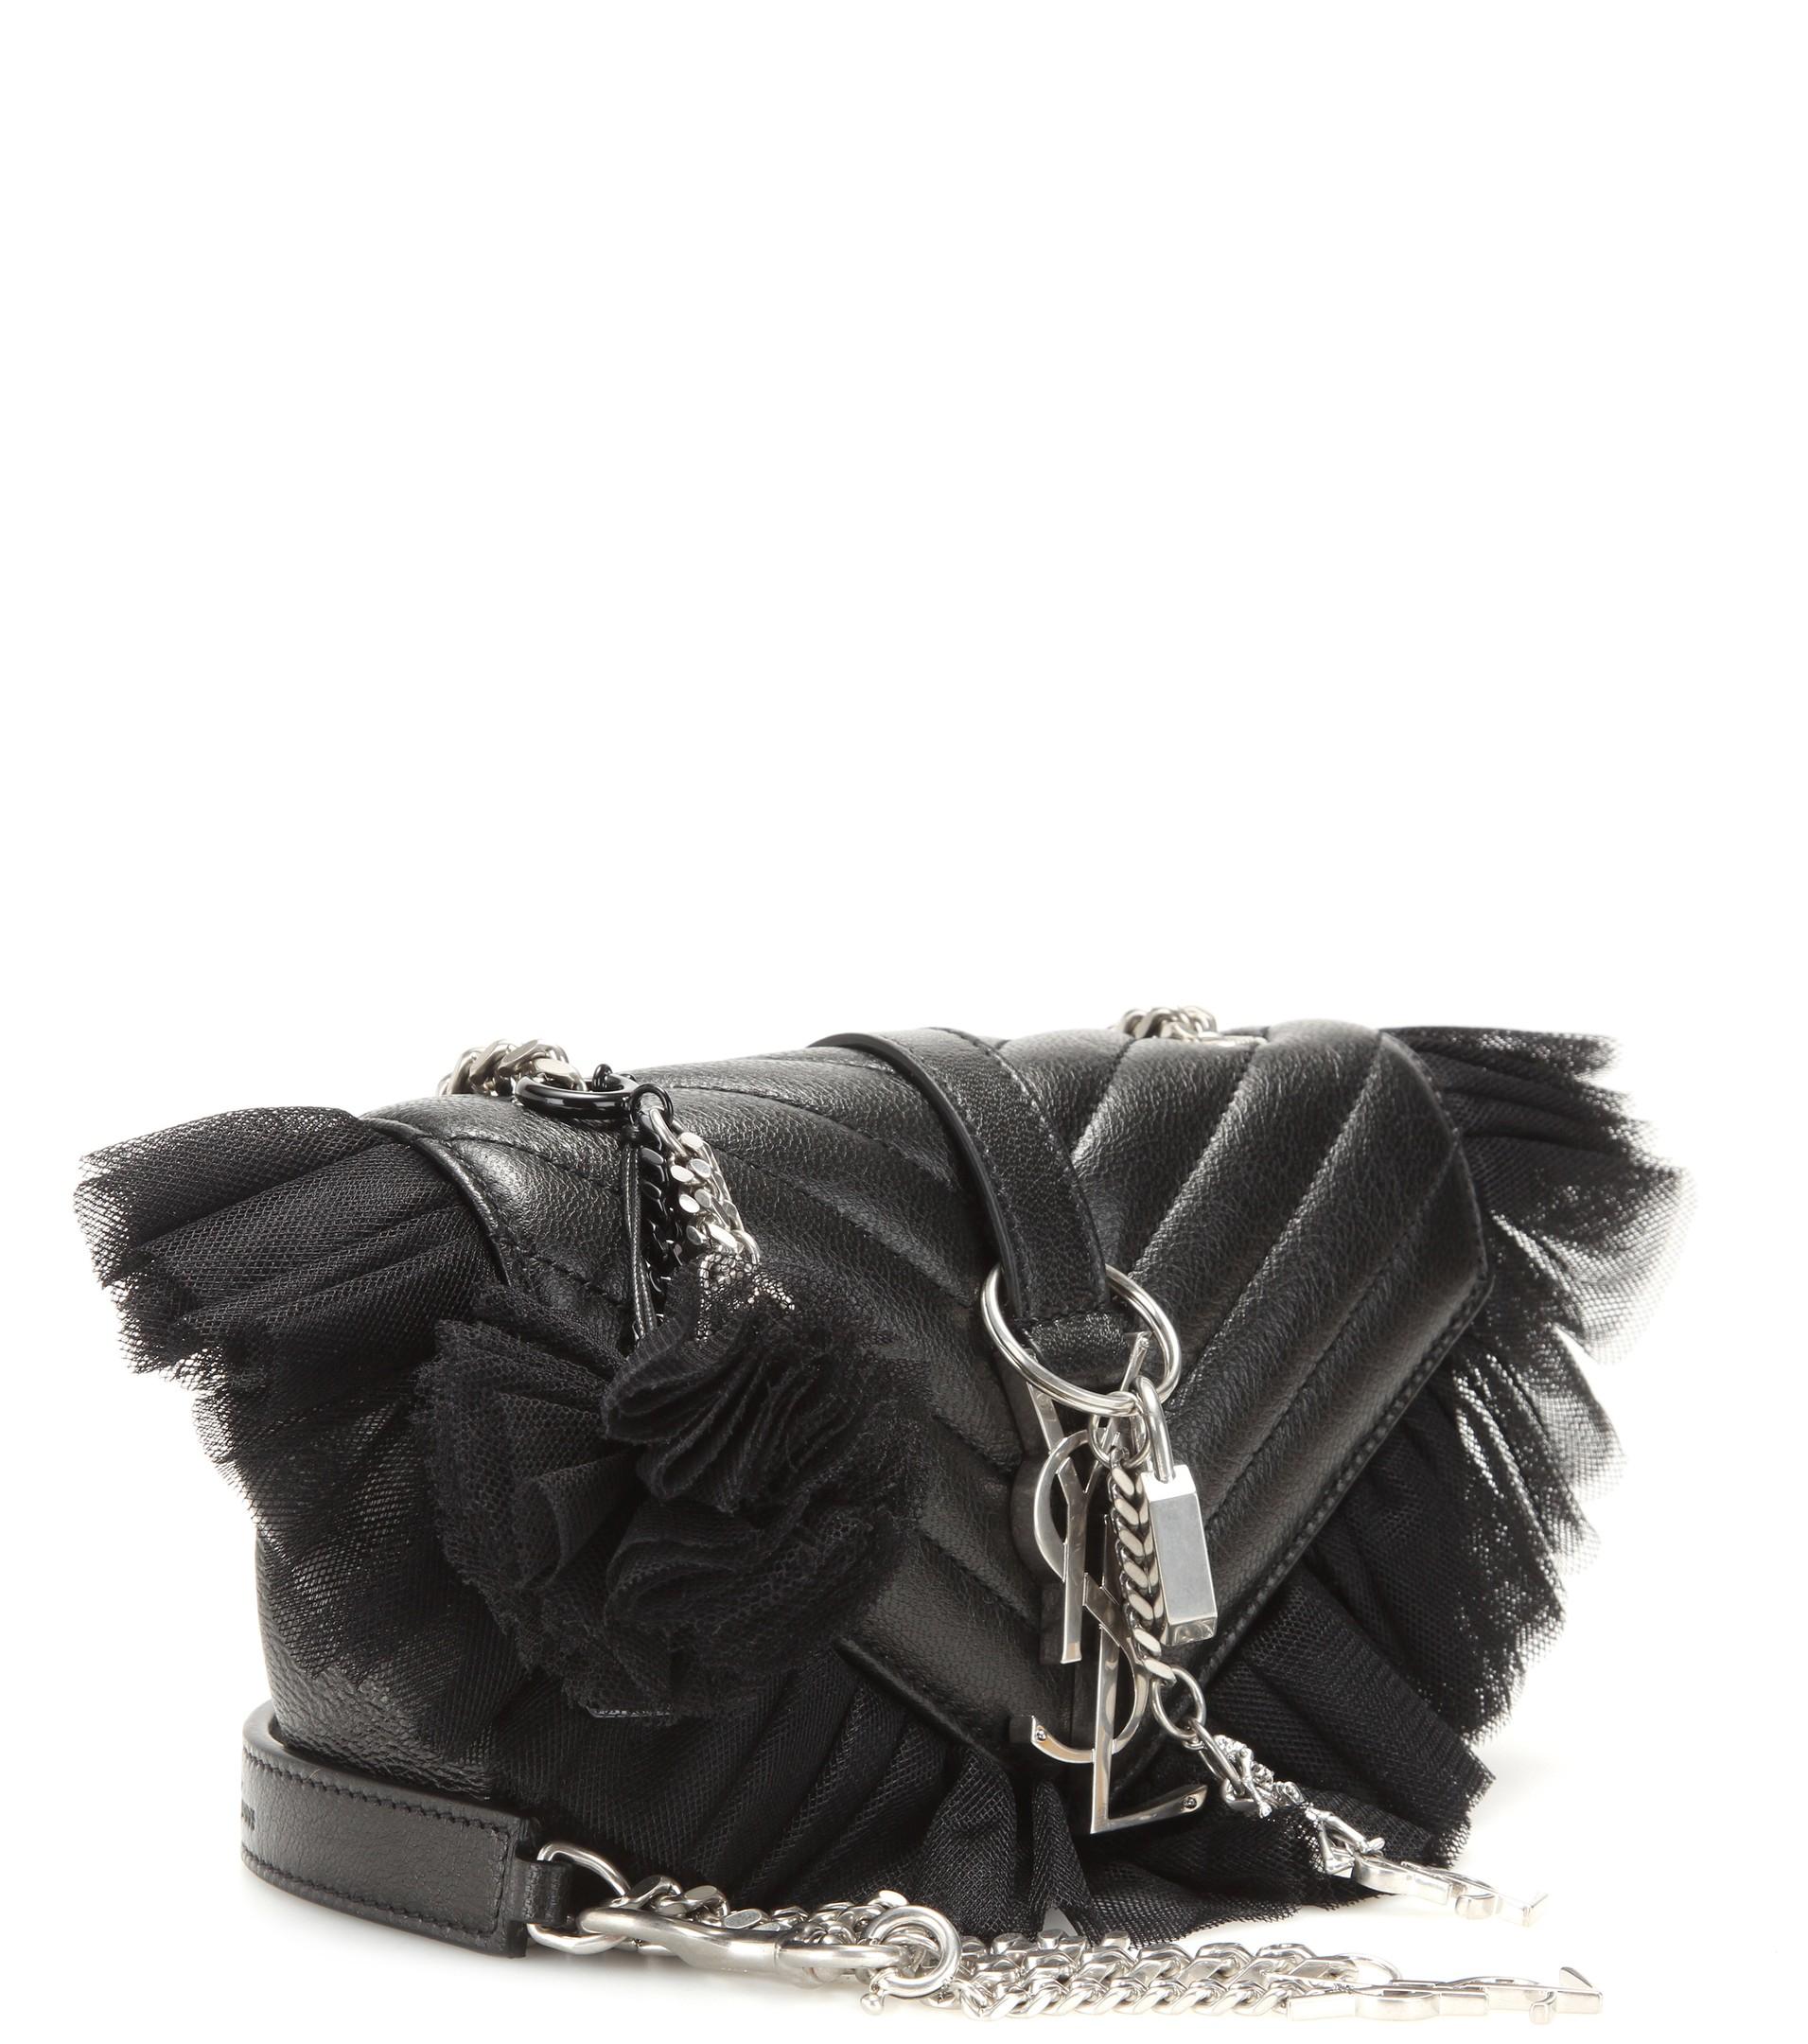 Lyst - Saint Laurent Monogram Baby Embellished Quilted Leather Shoulder Bag  in Black a67362d1a2a2e